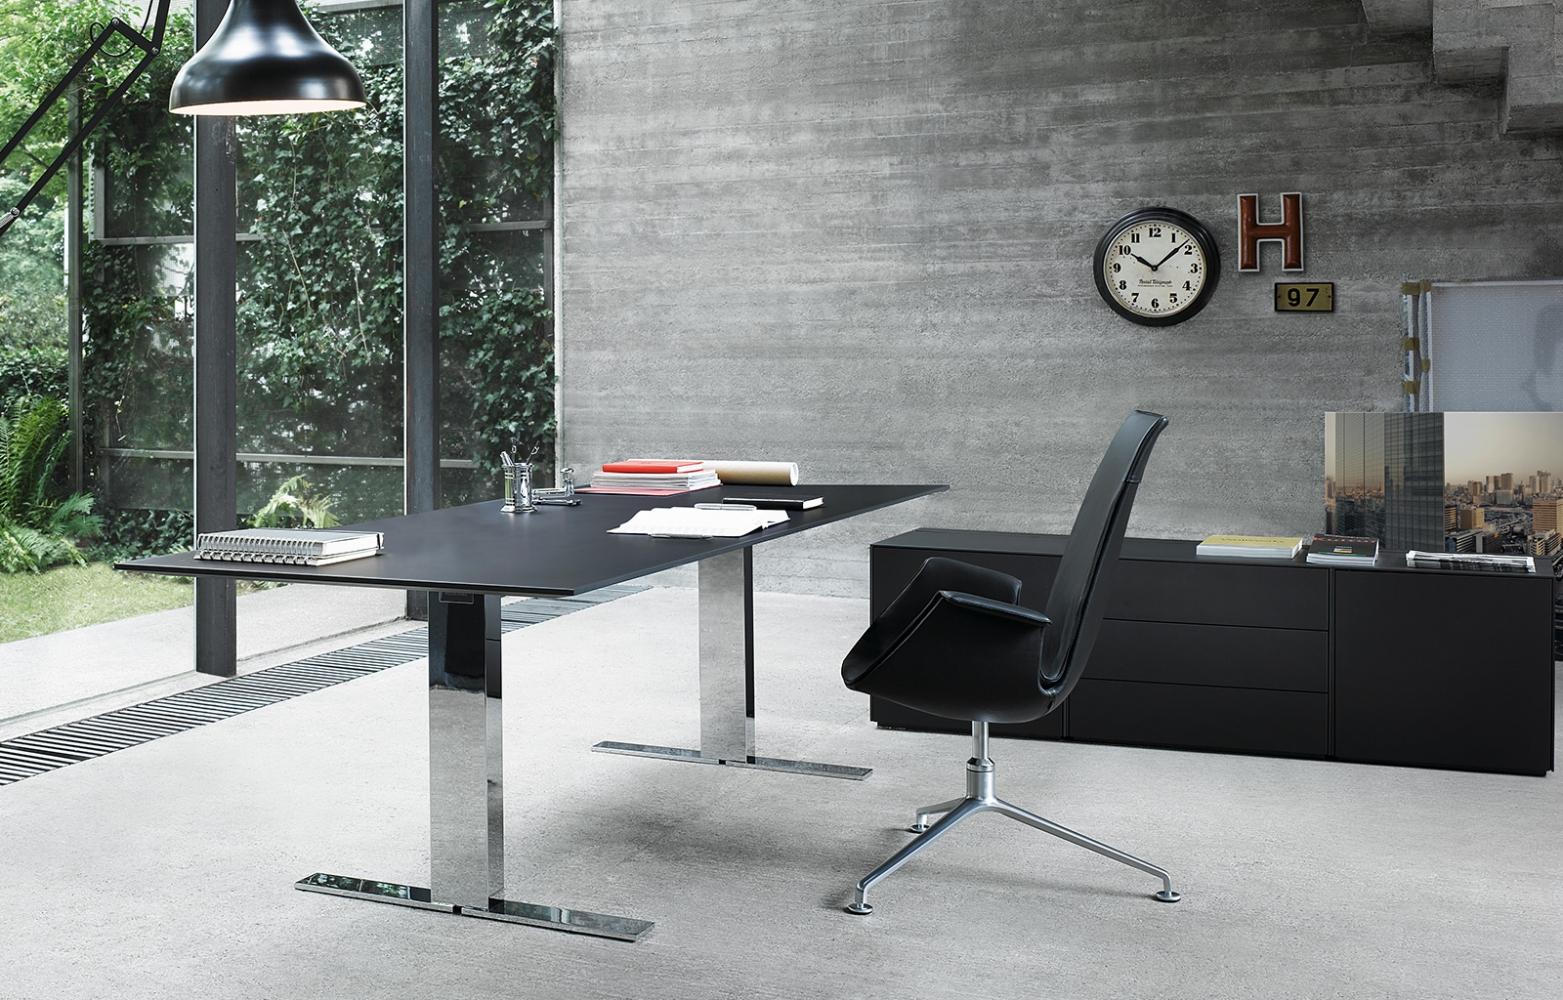 walter knoll fk kuipfauteuil fabricius kastholm. Black Bedroom Furniture Sets. Home Design Ideas